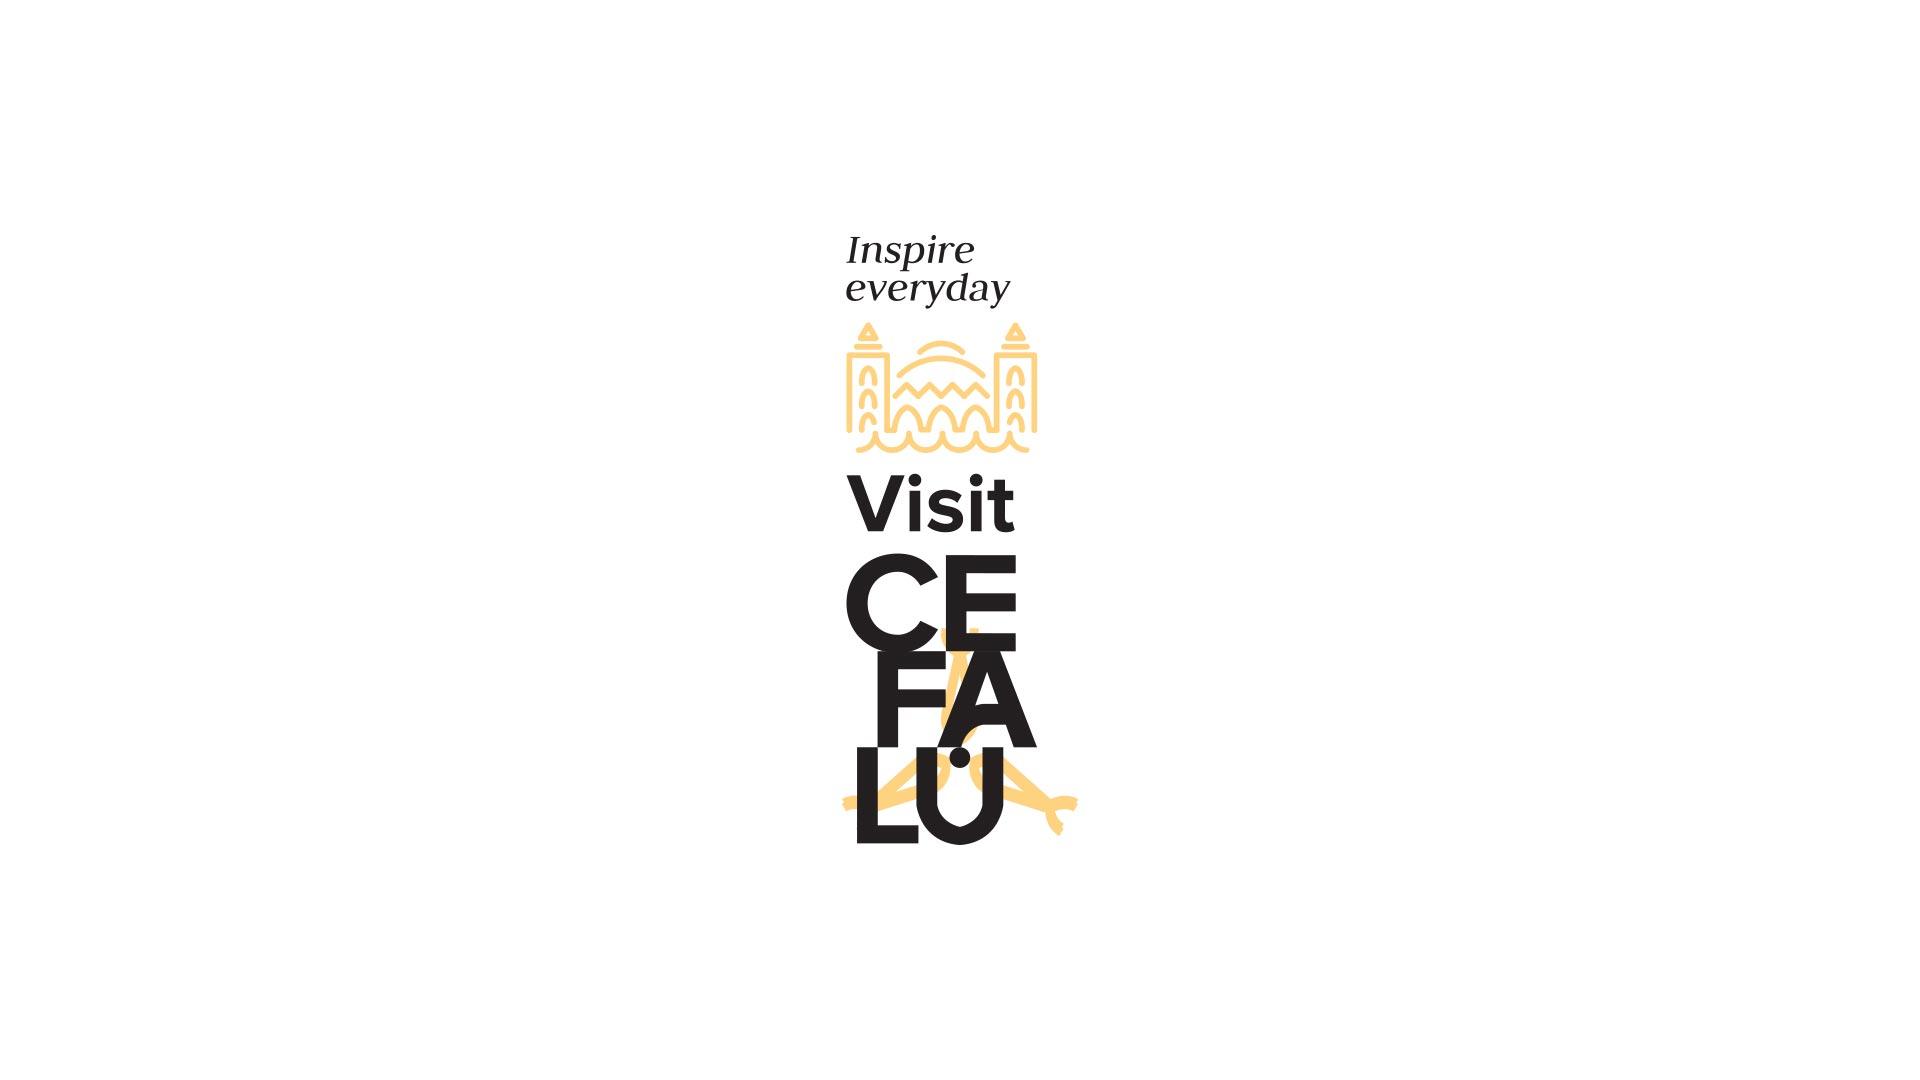 visit cefalu logotipo grafico milano 012